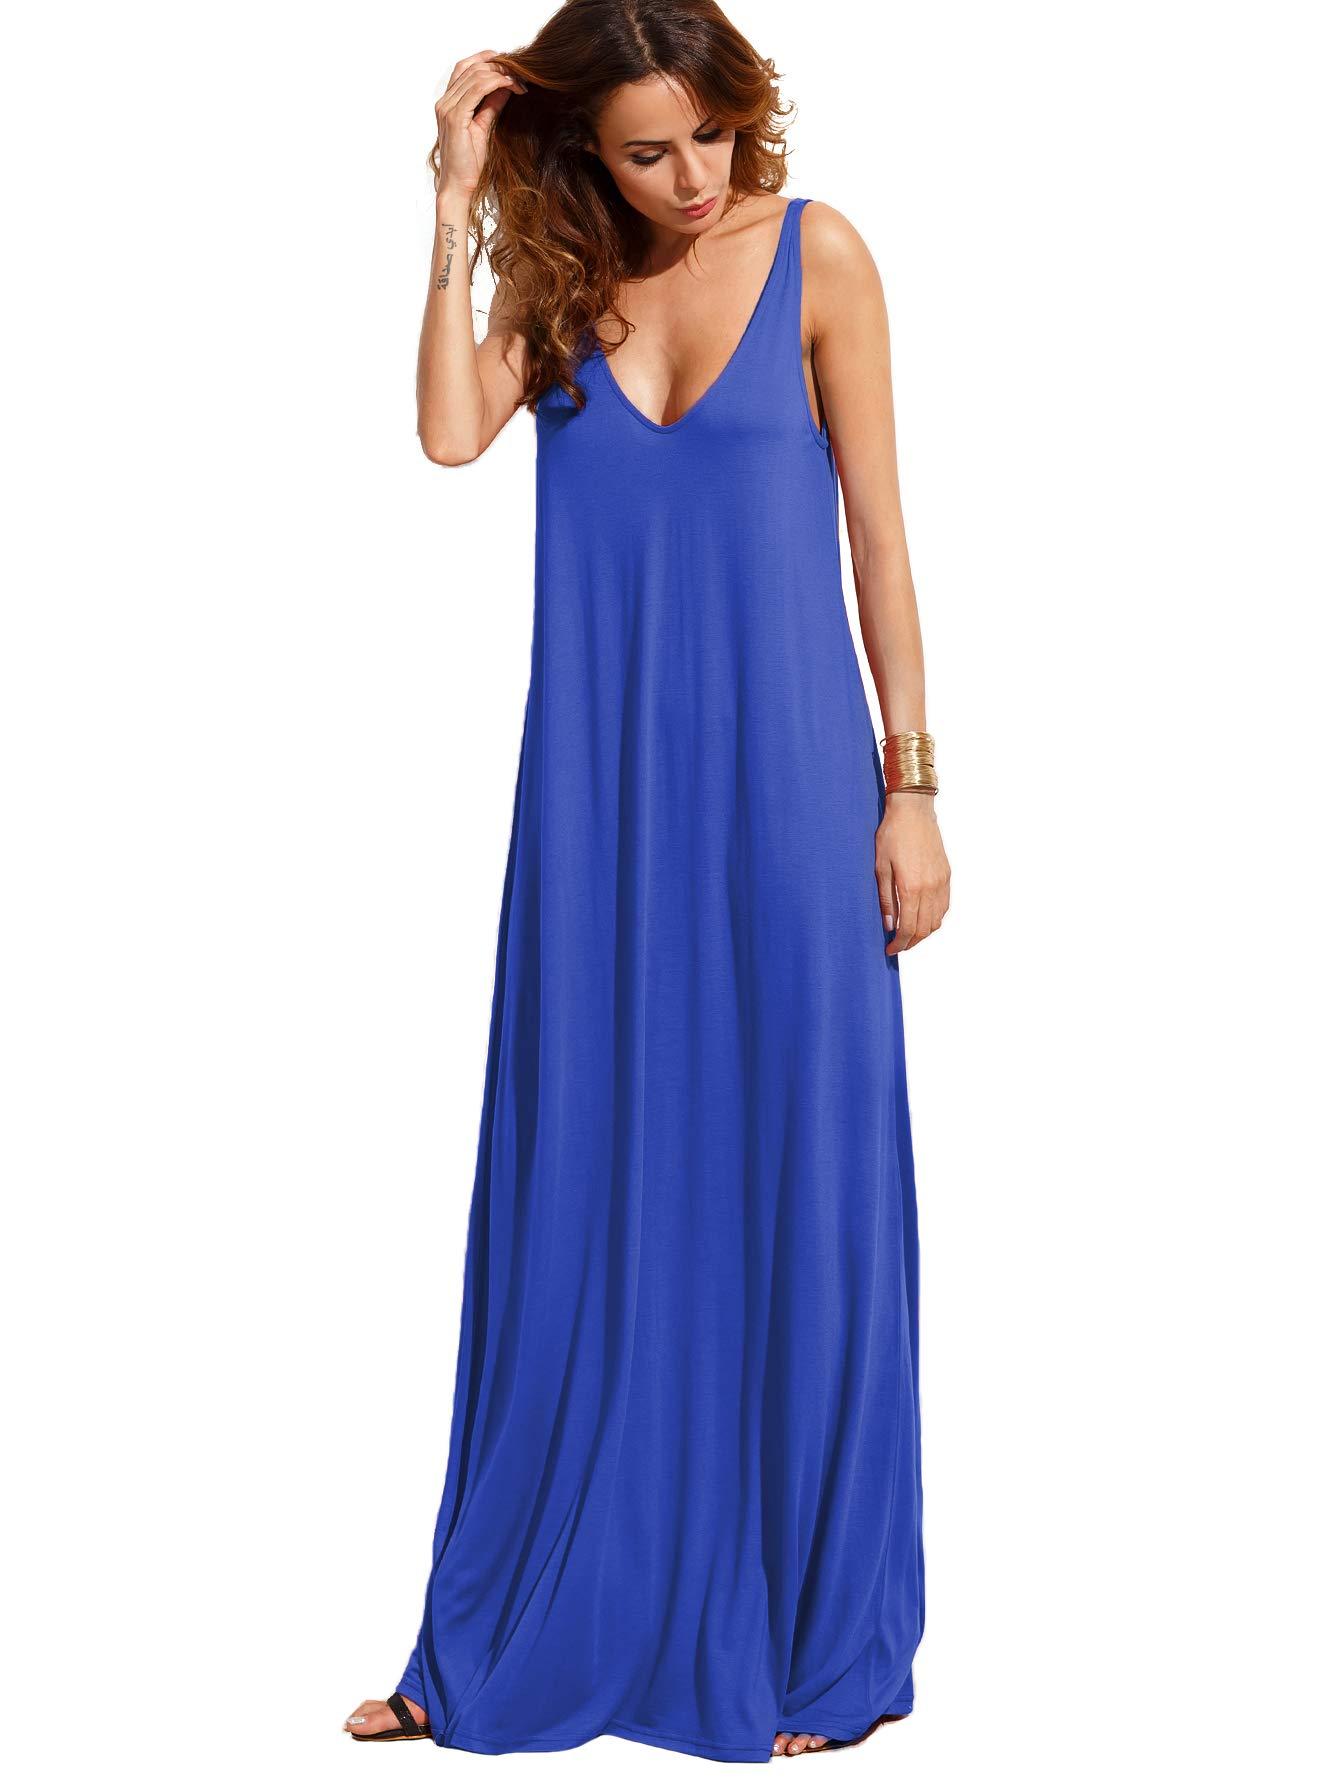 Available at Amazon: Verdusa Women's Casual Sleeveless Deep V Neck Summer Beach Maxi Long Dress